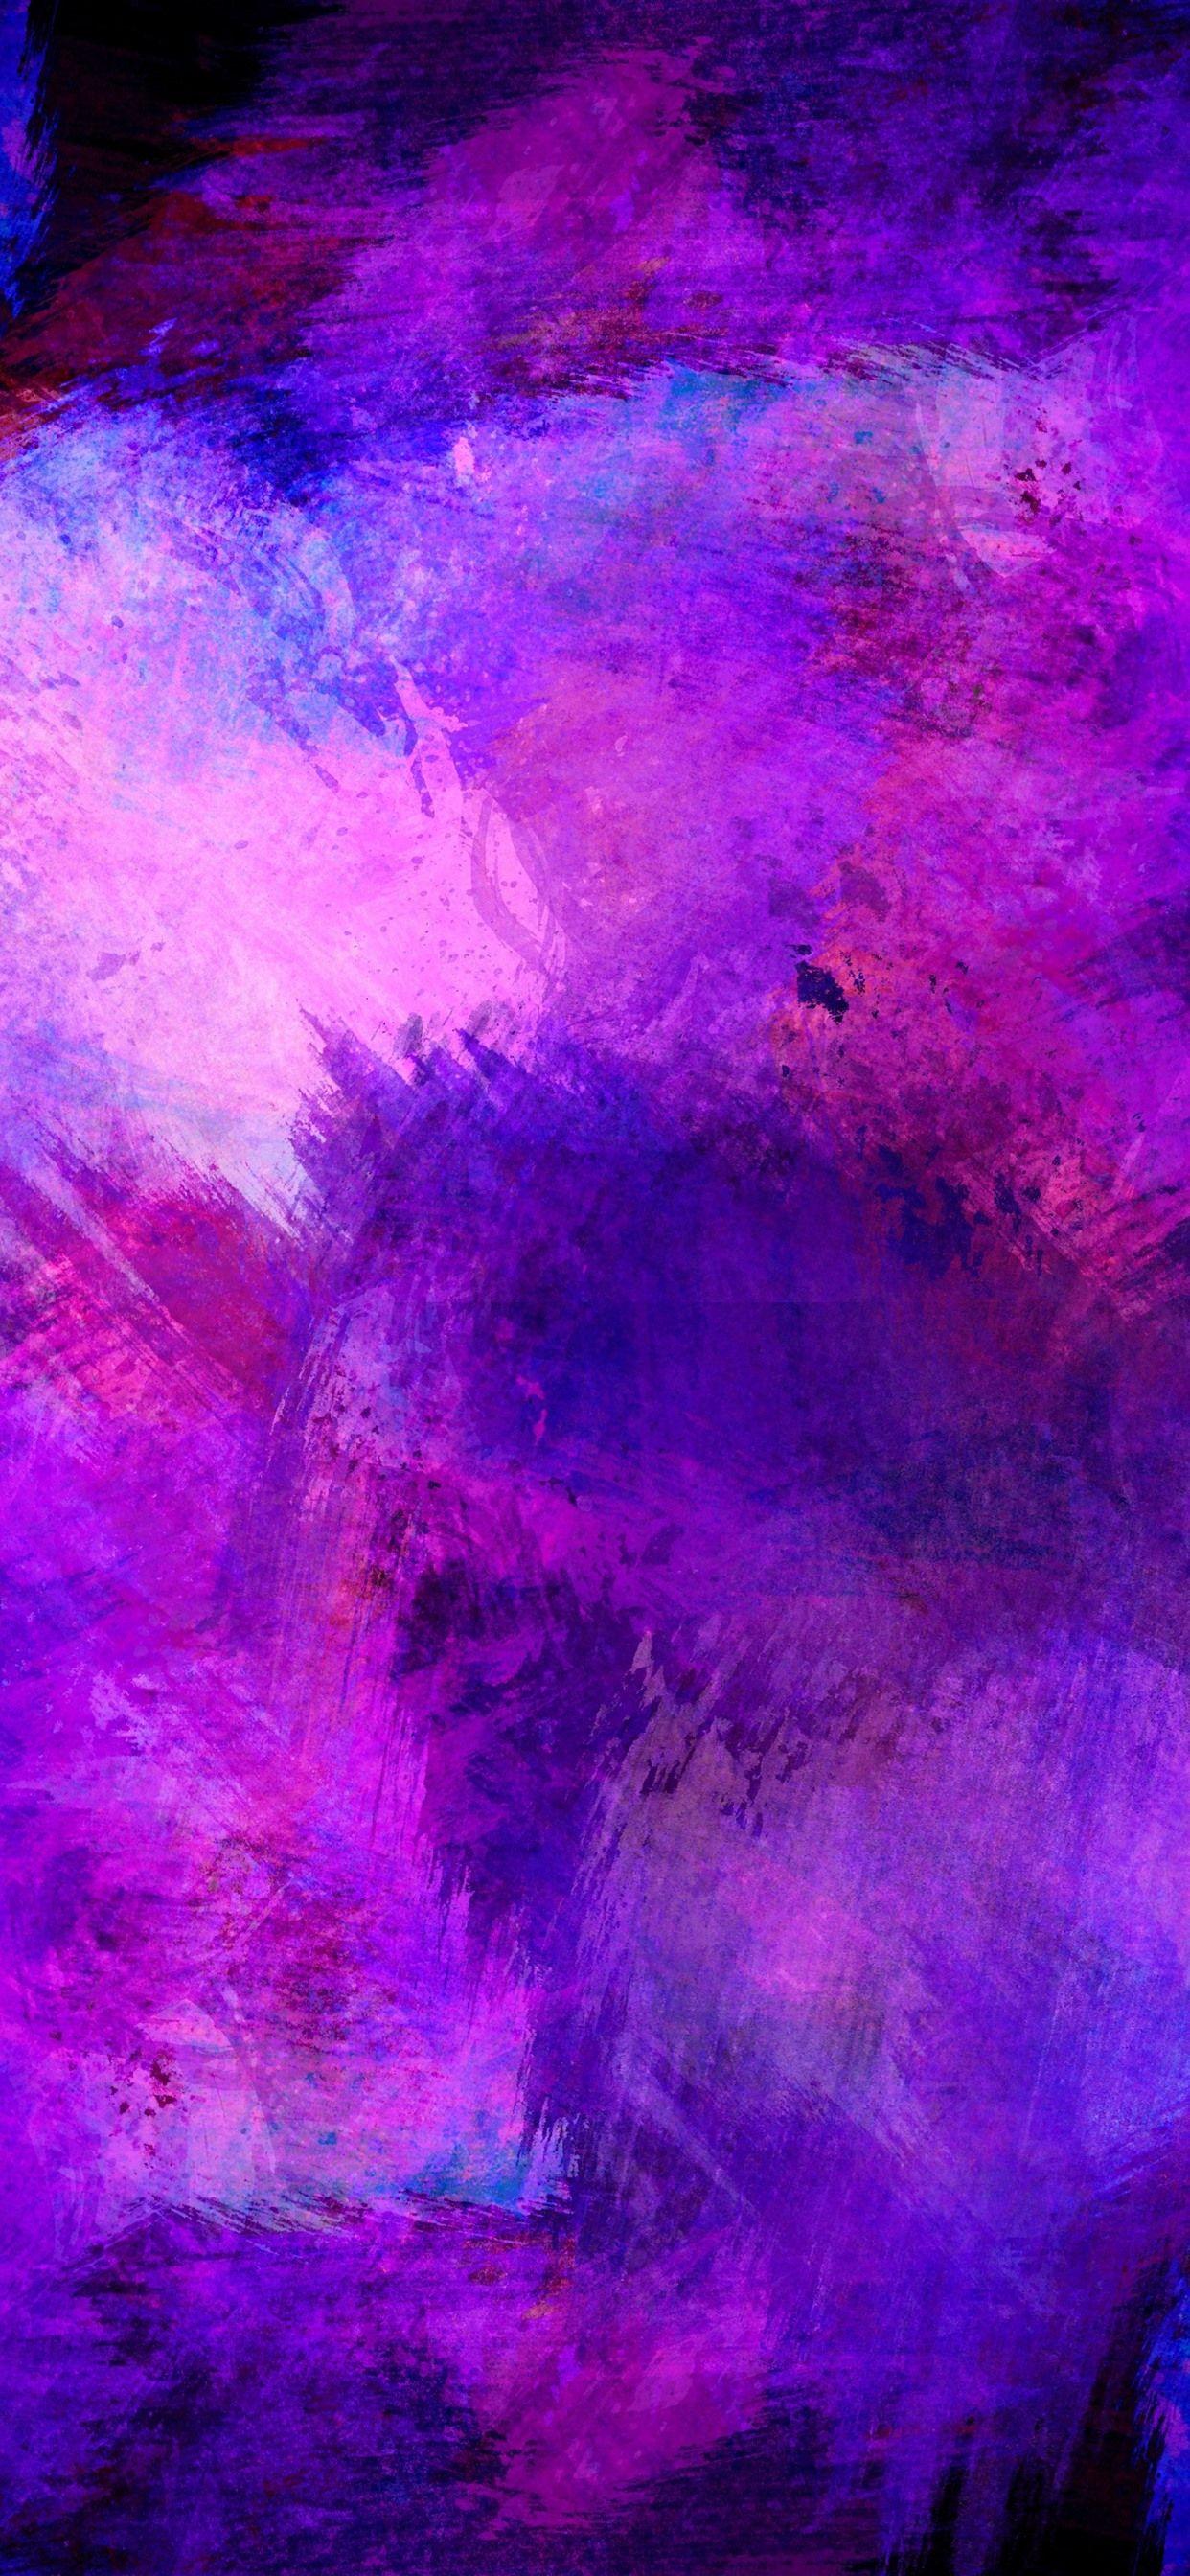 Purple Iphone Wallpapers 4k Hd Purple Iphone Backgrounds On Wallpaperbat